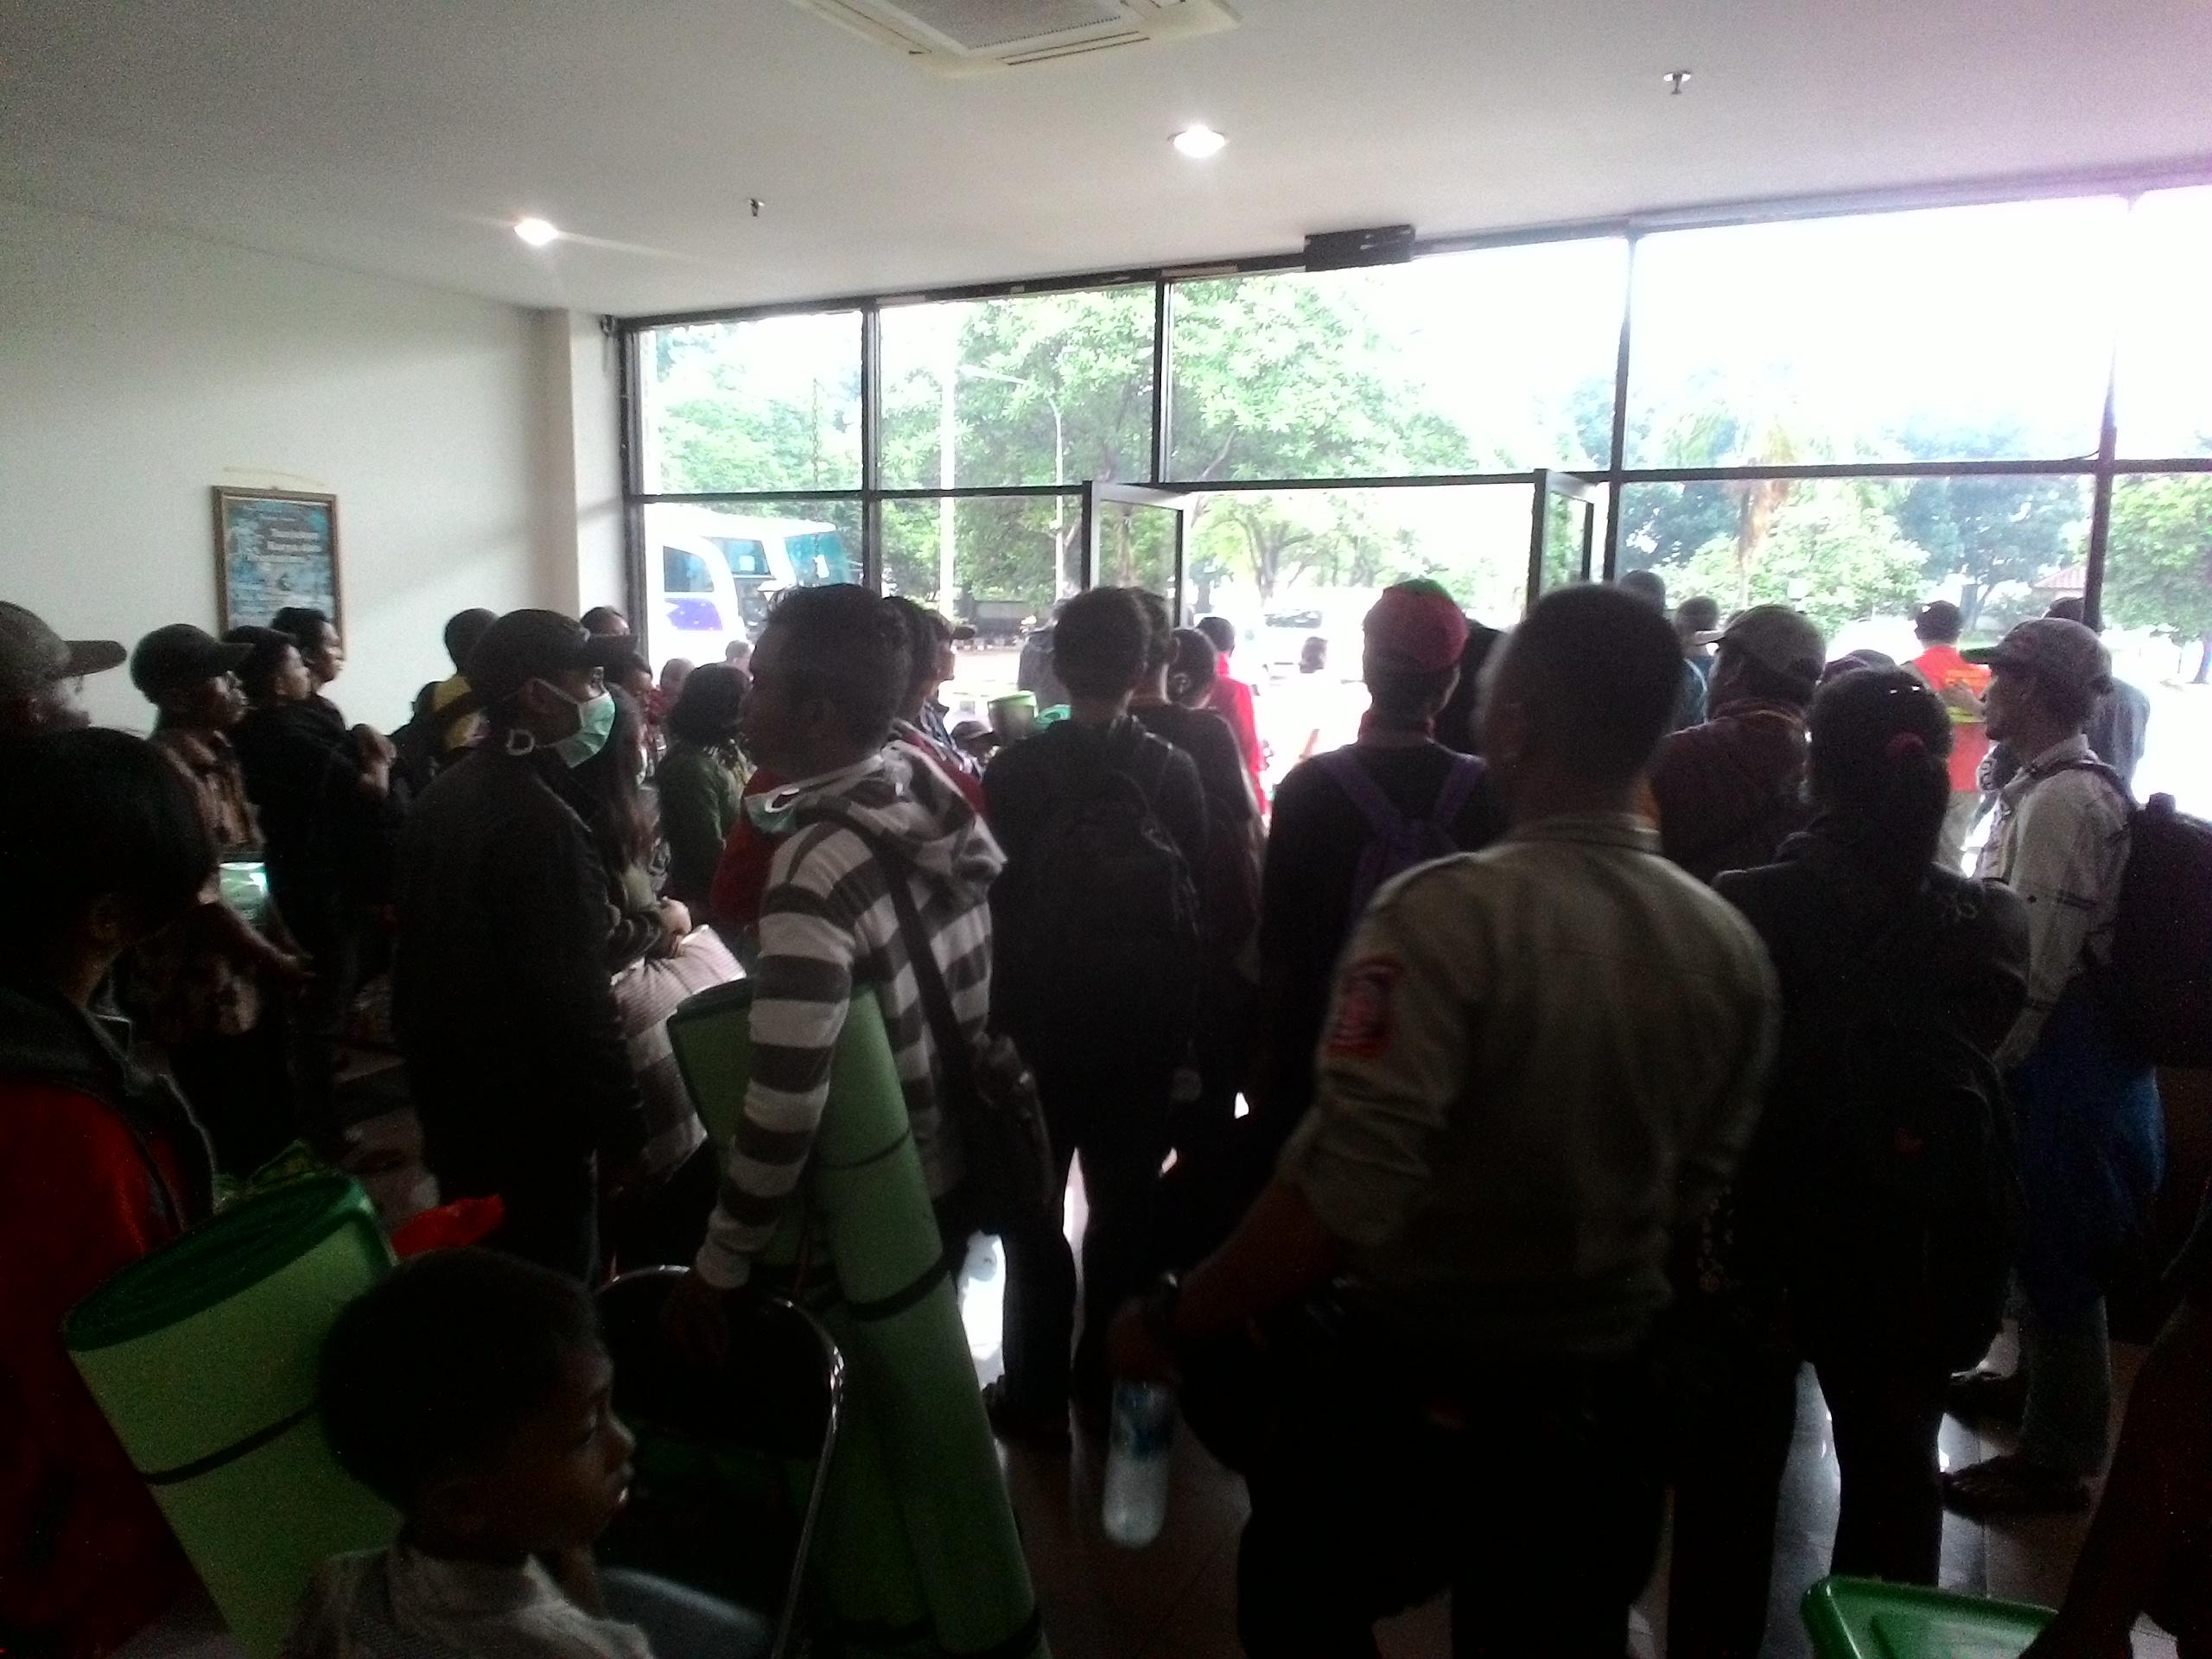 Ratusan Pengungsi Eks Gafatar di Cibubur dipindahkan ke Cimahi